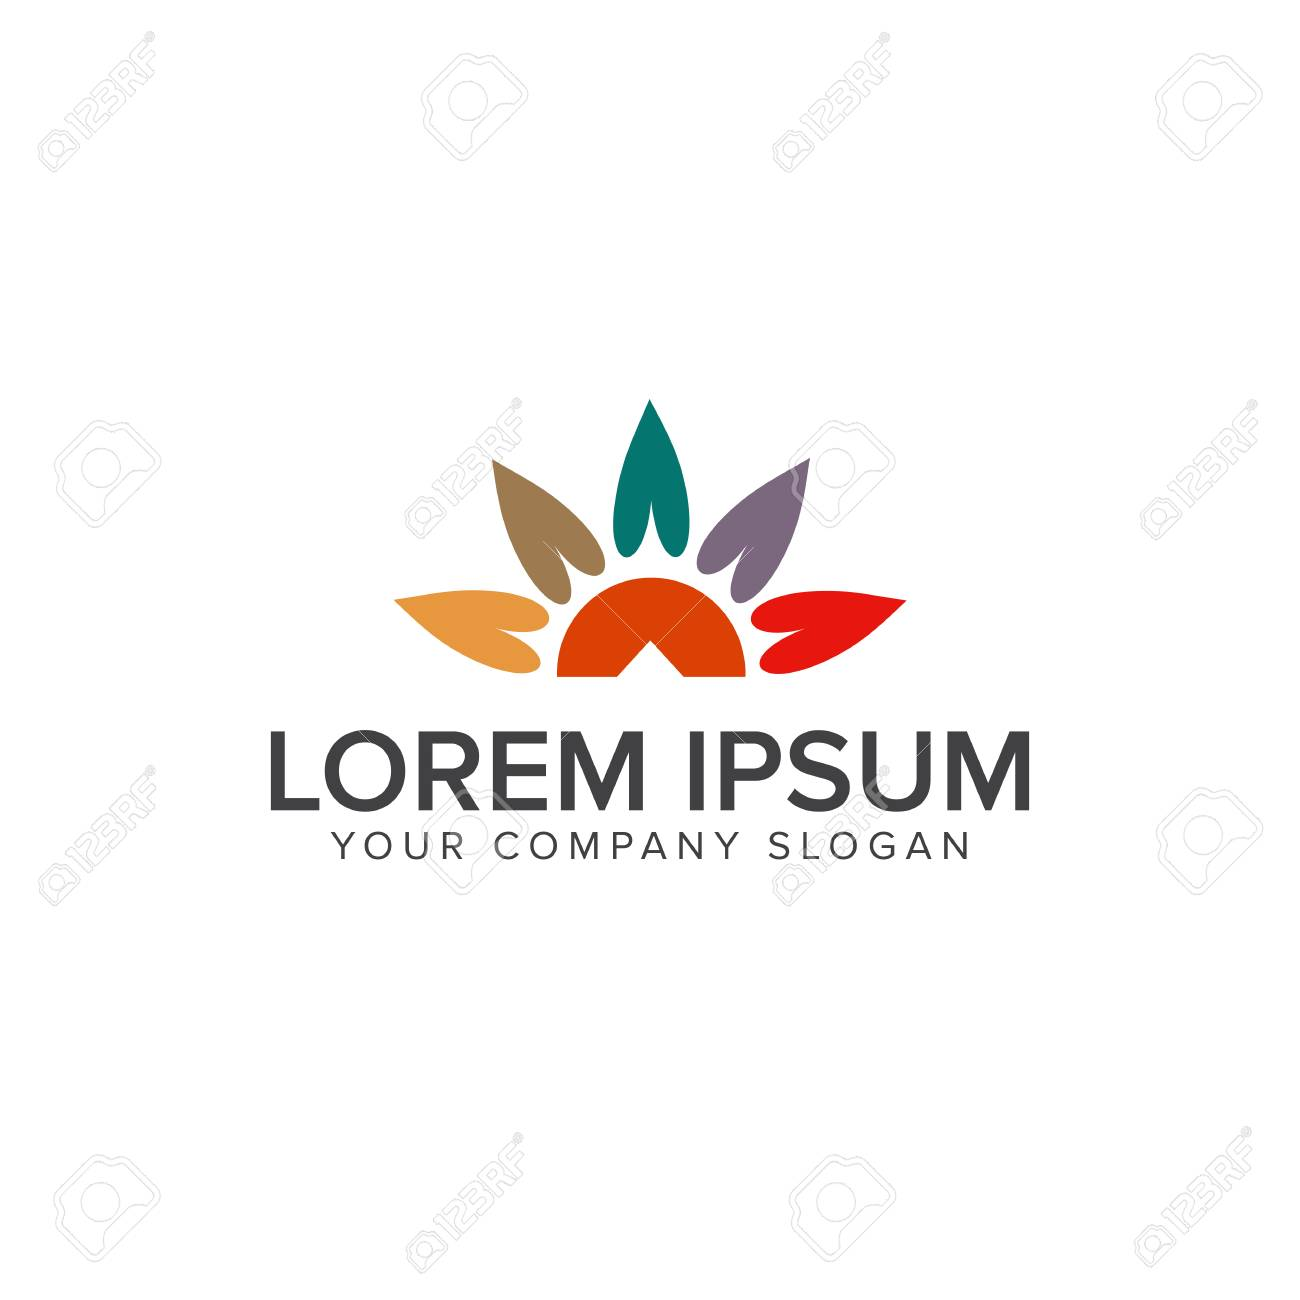 Sun Leaf Logo Design Concept Template Royalty Free Cliparts, Vectors ...